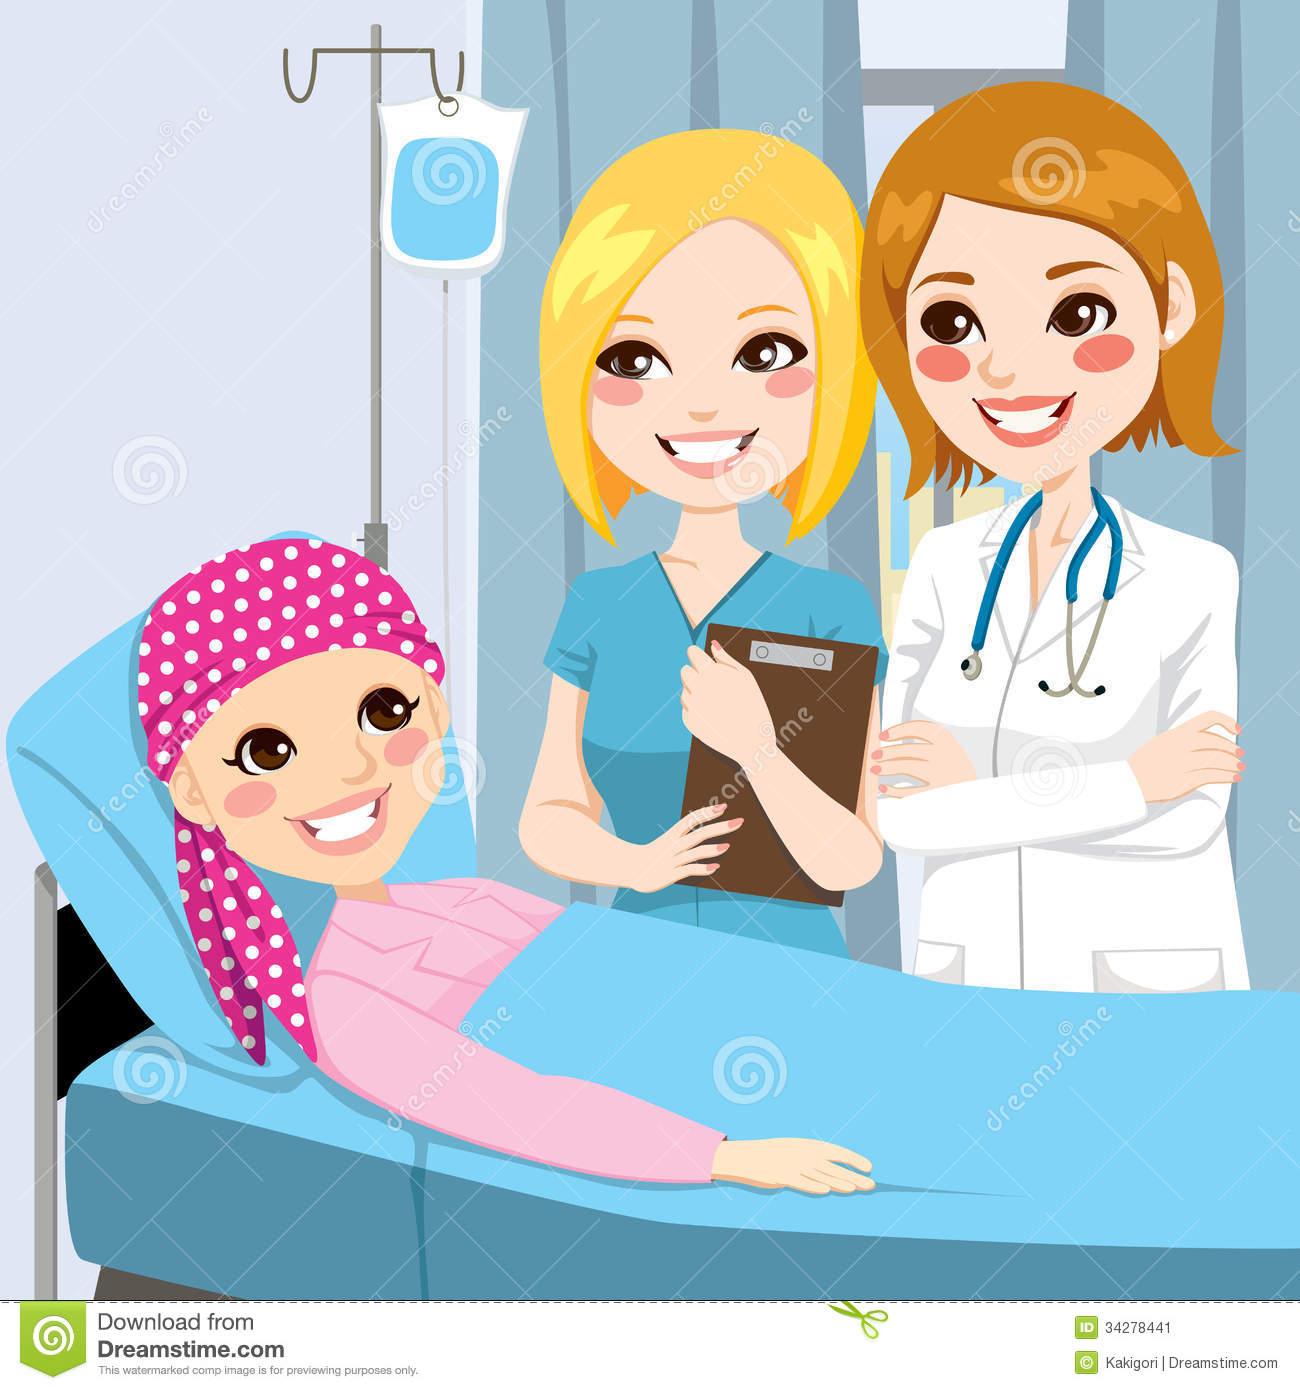 Cancer treatment clipart.